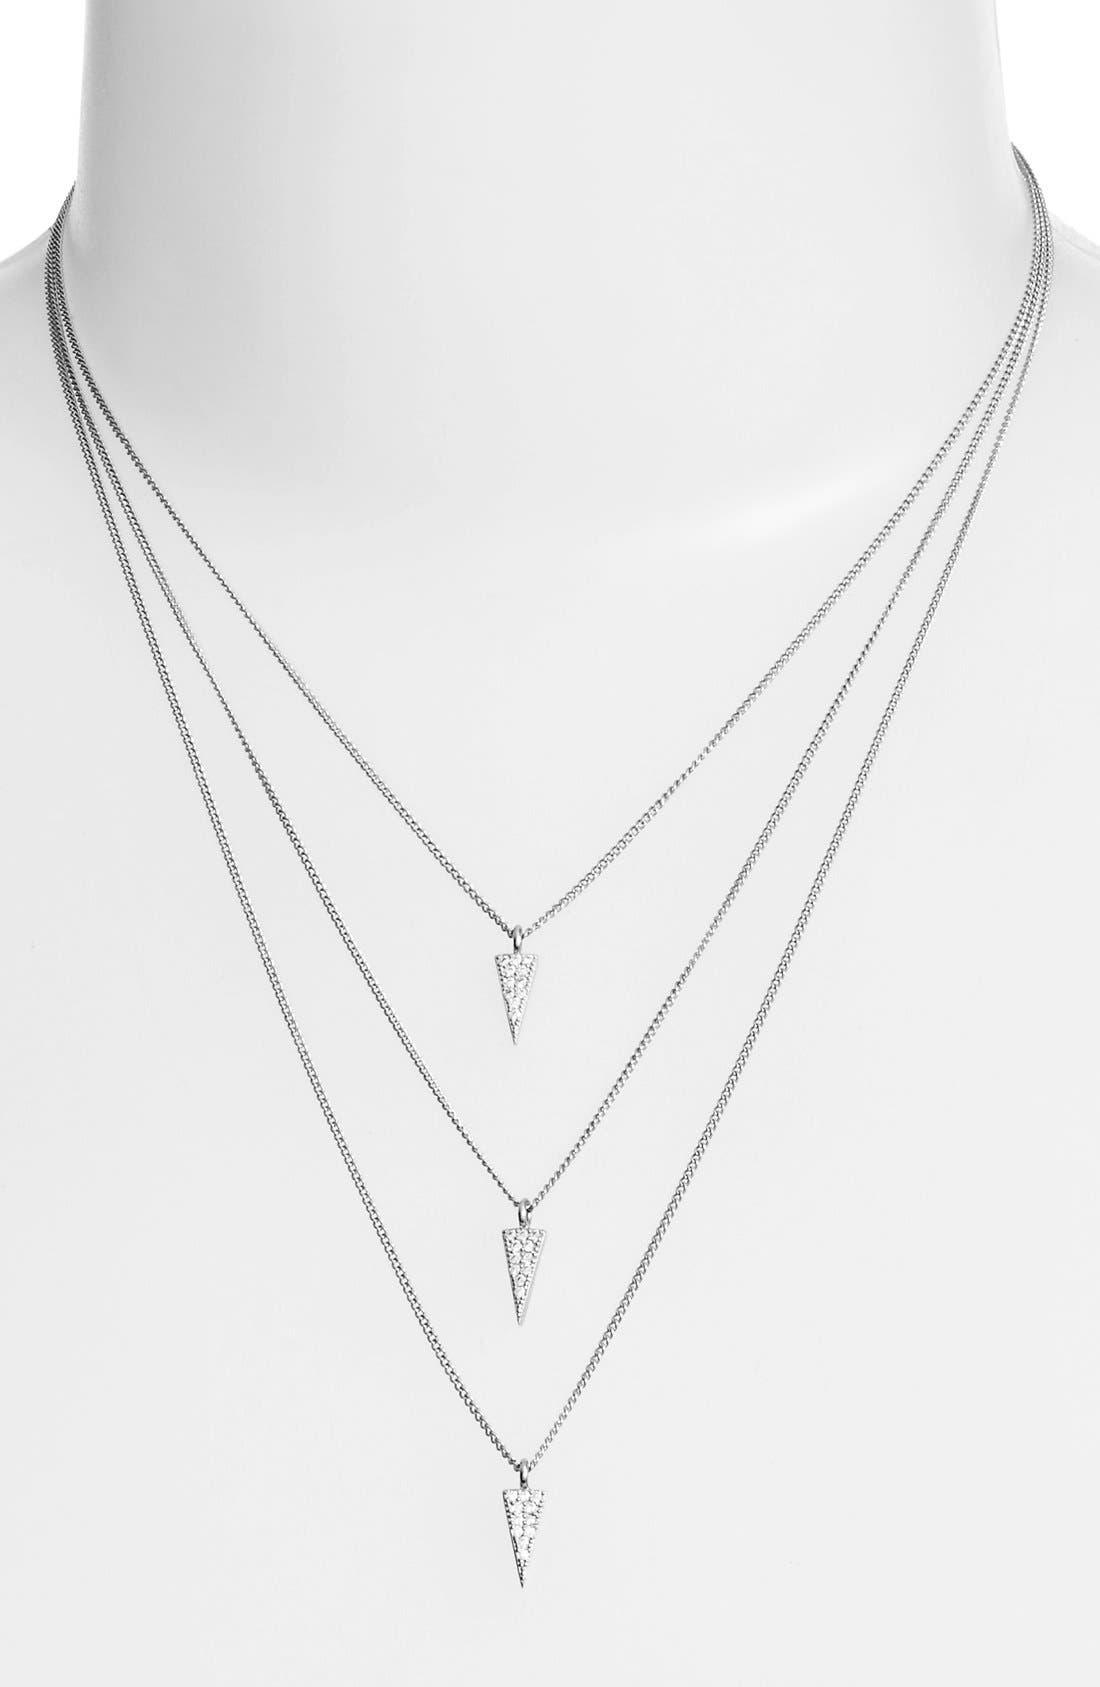 Alternate Image 1 Selected - Melanie AuldTriple Layer Pavé Pendant Necklace